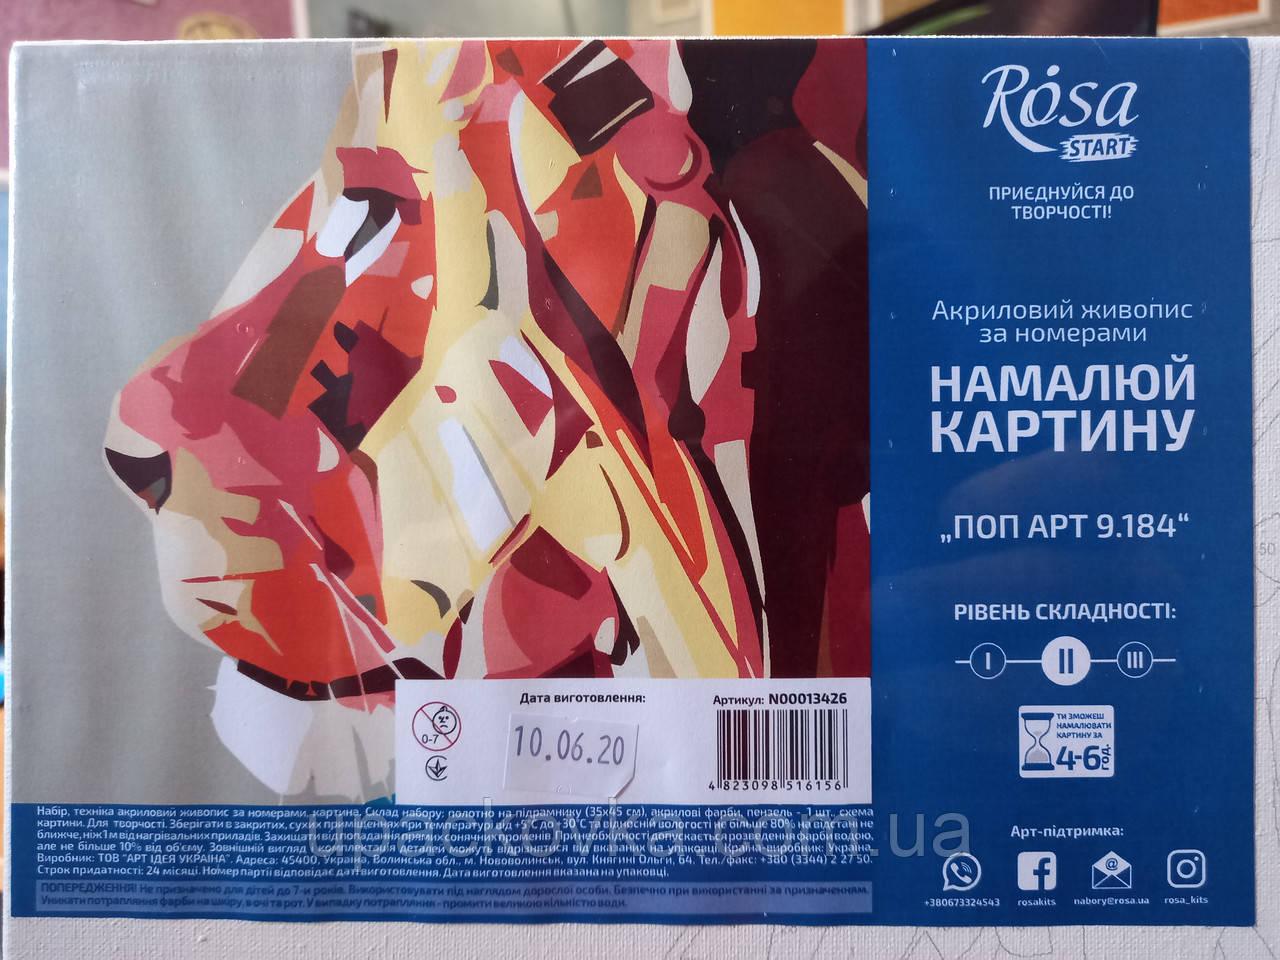 "Набор-стандарт, картина по номерам, ""ПОП АРТ 9.184, 35х45см, ROSA START"